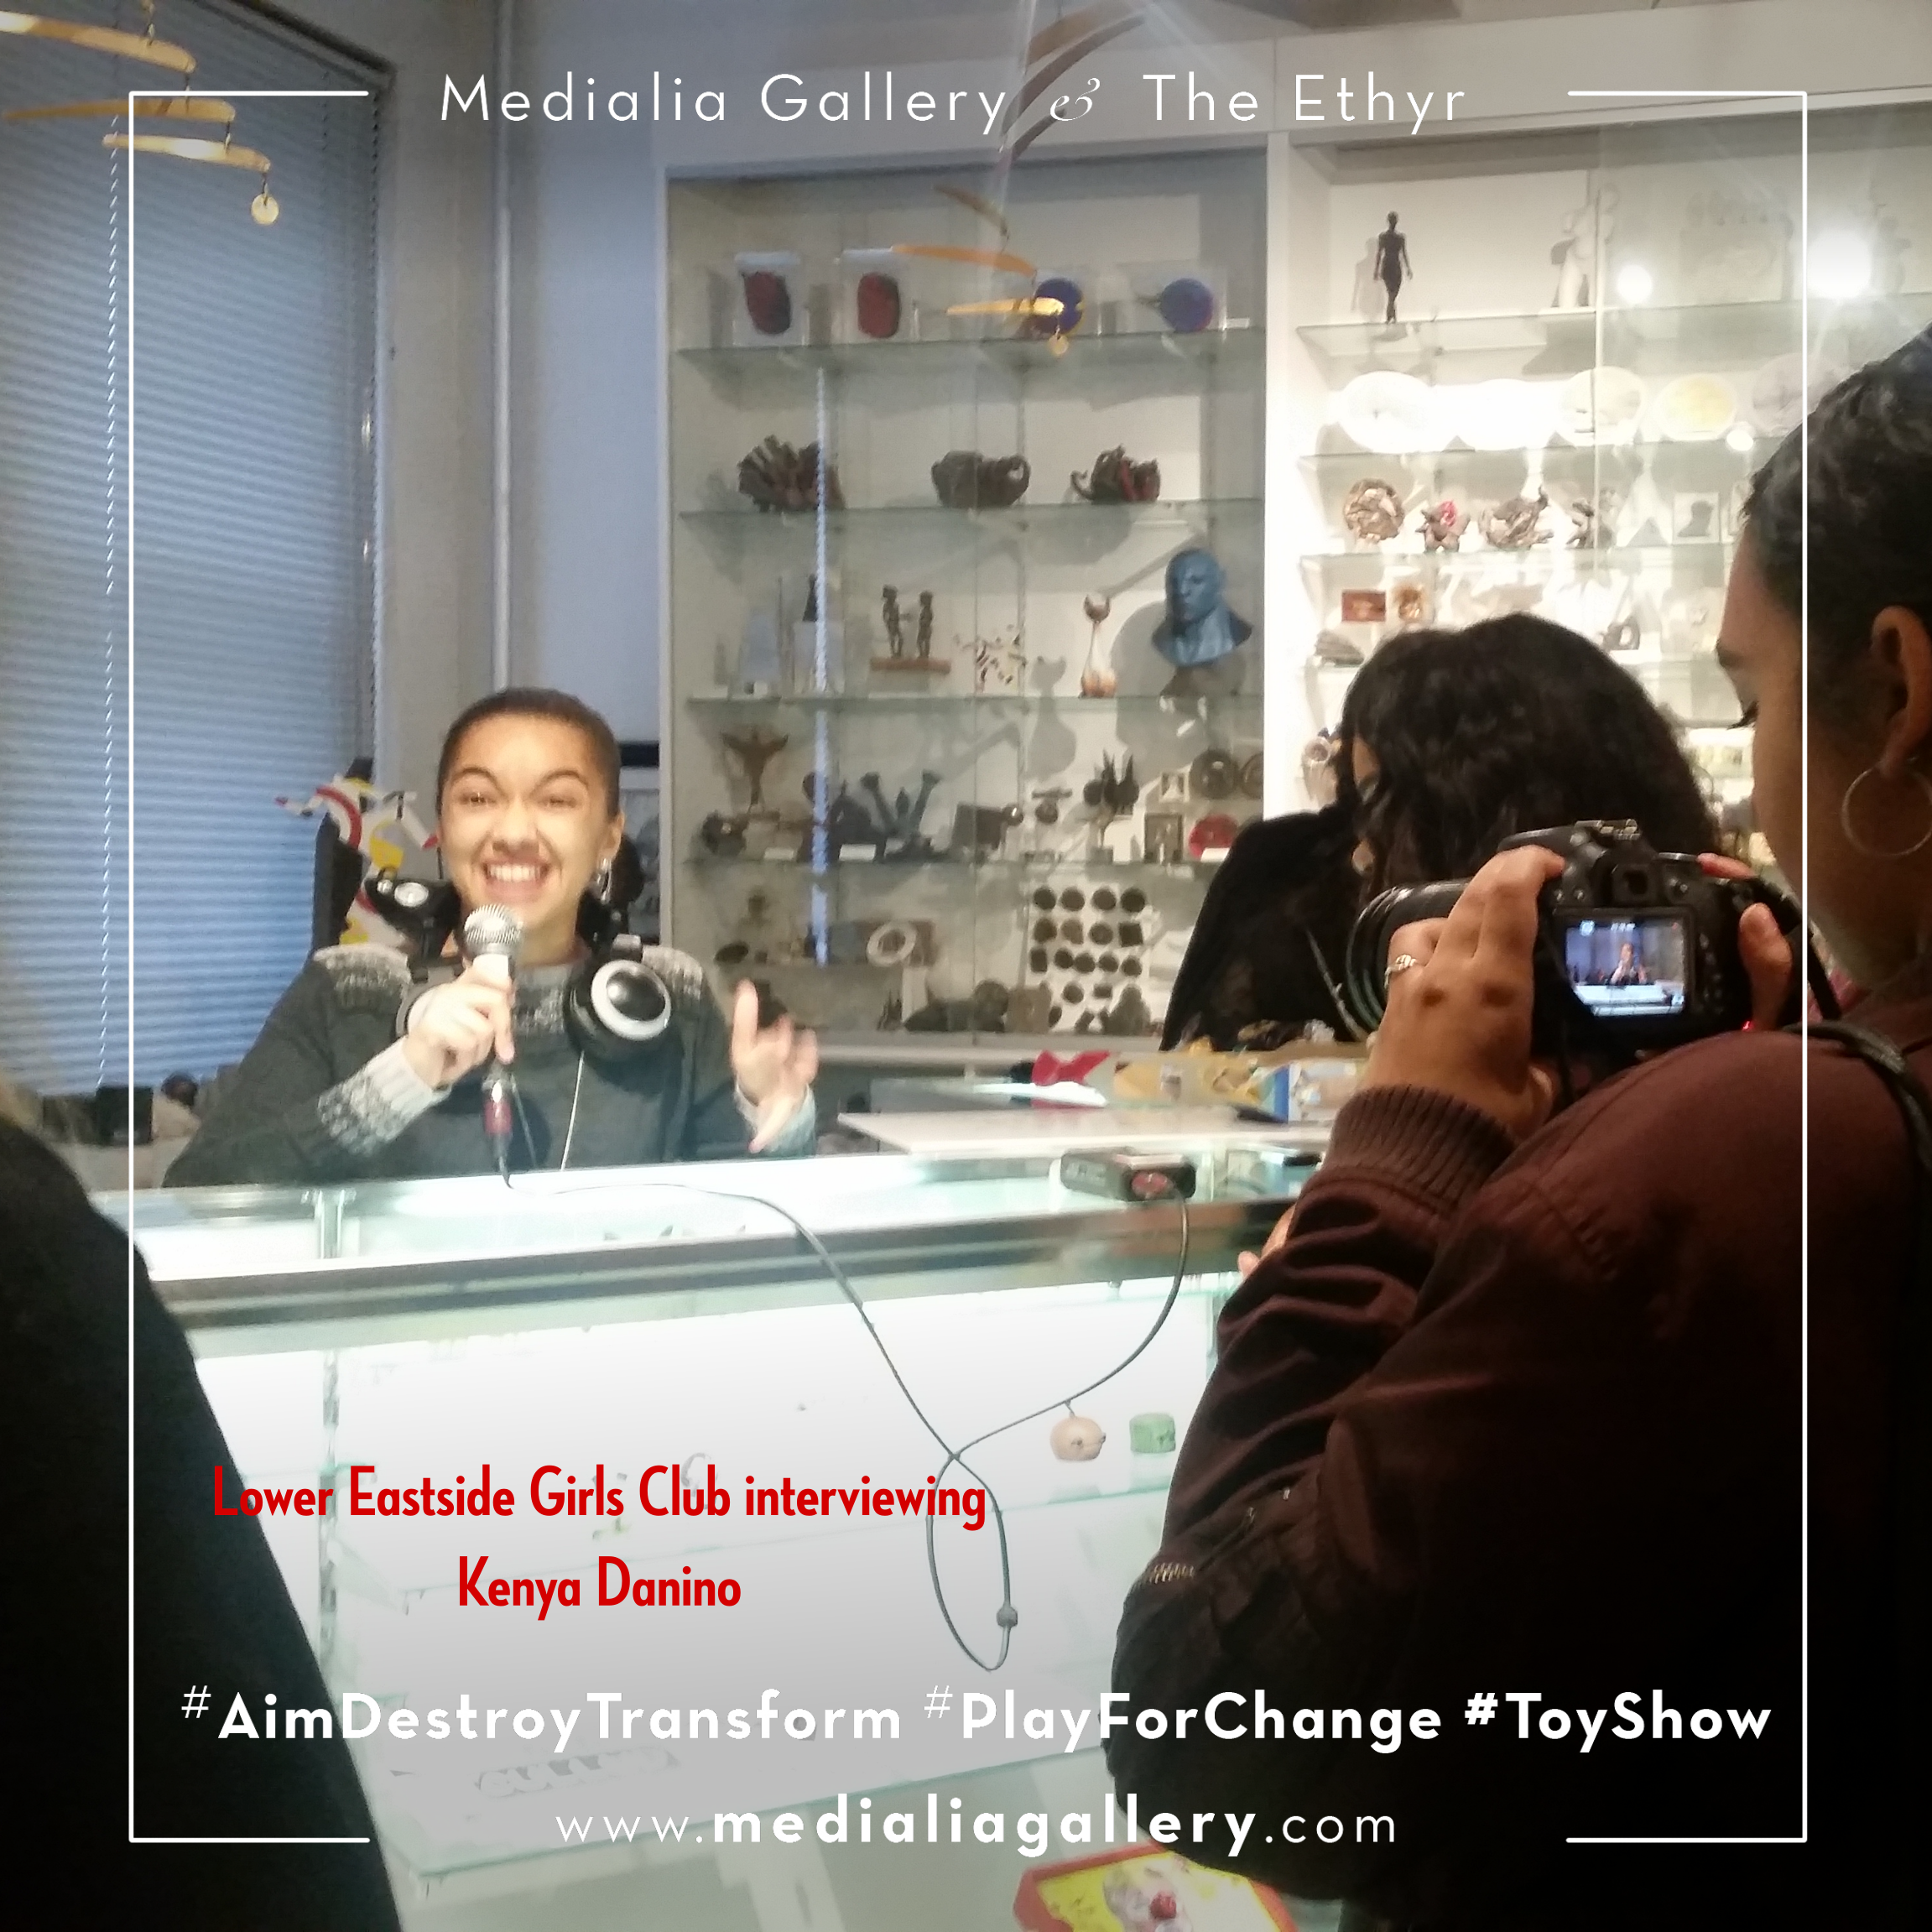 MedialiaGallery_The_Ethyr_AimDestroyTransform_Toy_Show_announcement_Kenya_Danino_November_2017.jpg.png